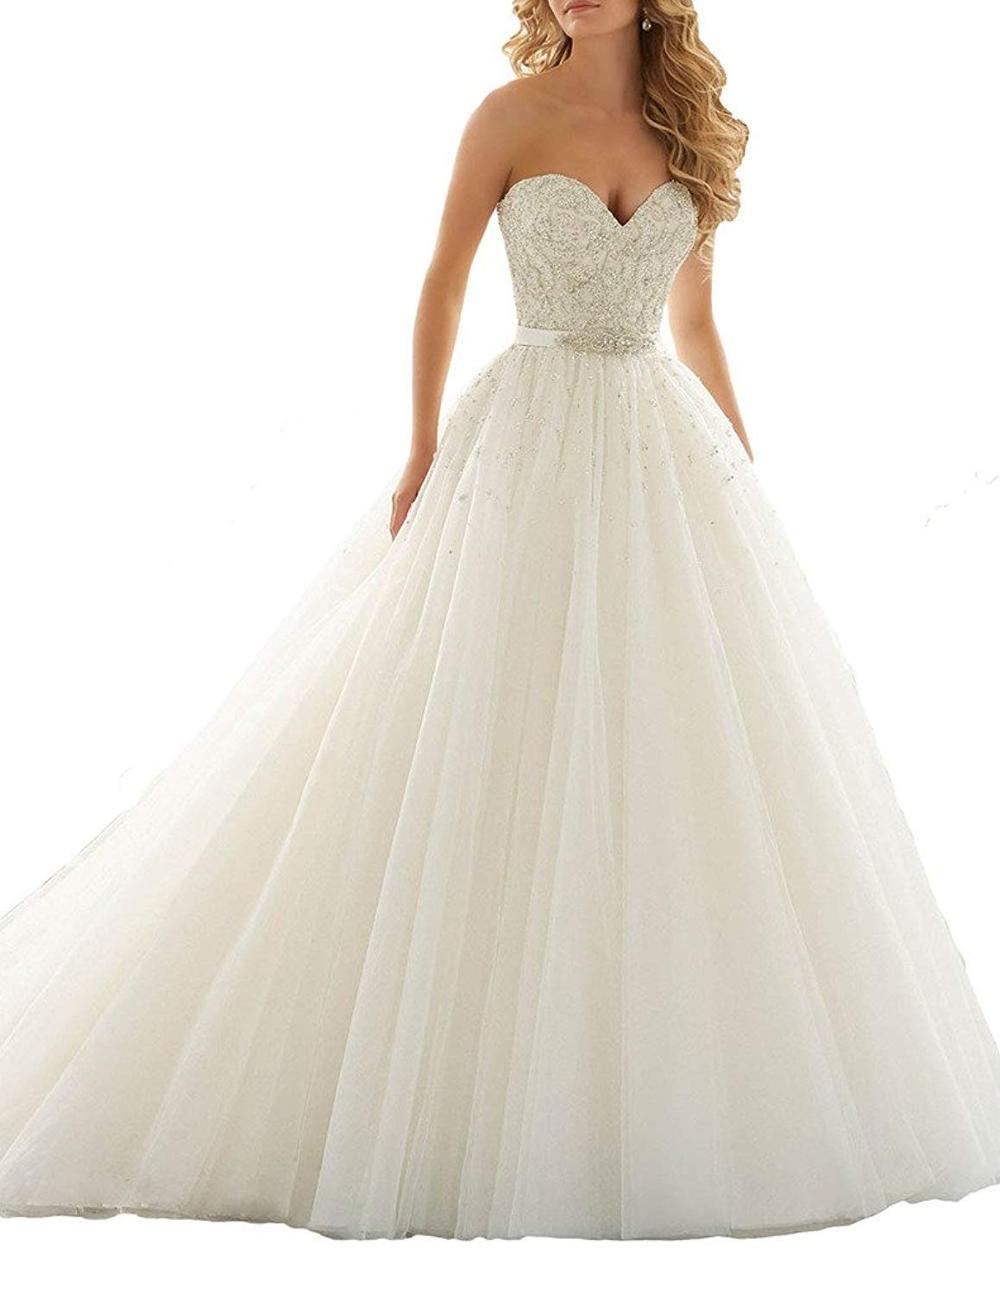 Wholesale ball gown designer - Online Buy Best ball gown designer ...